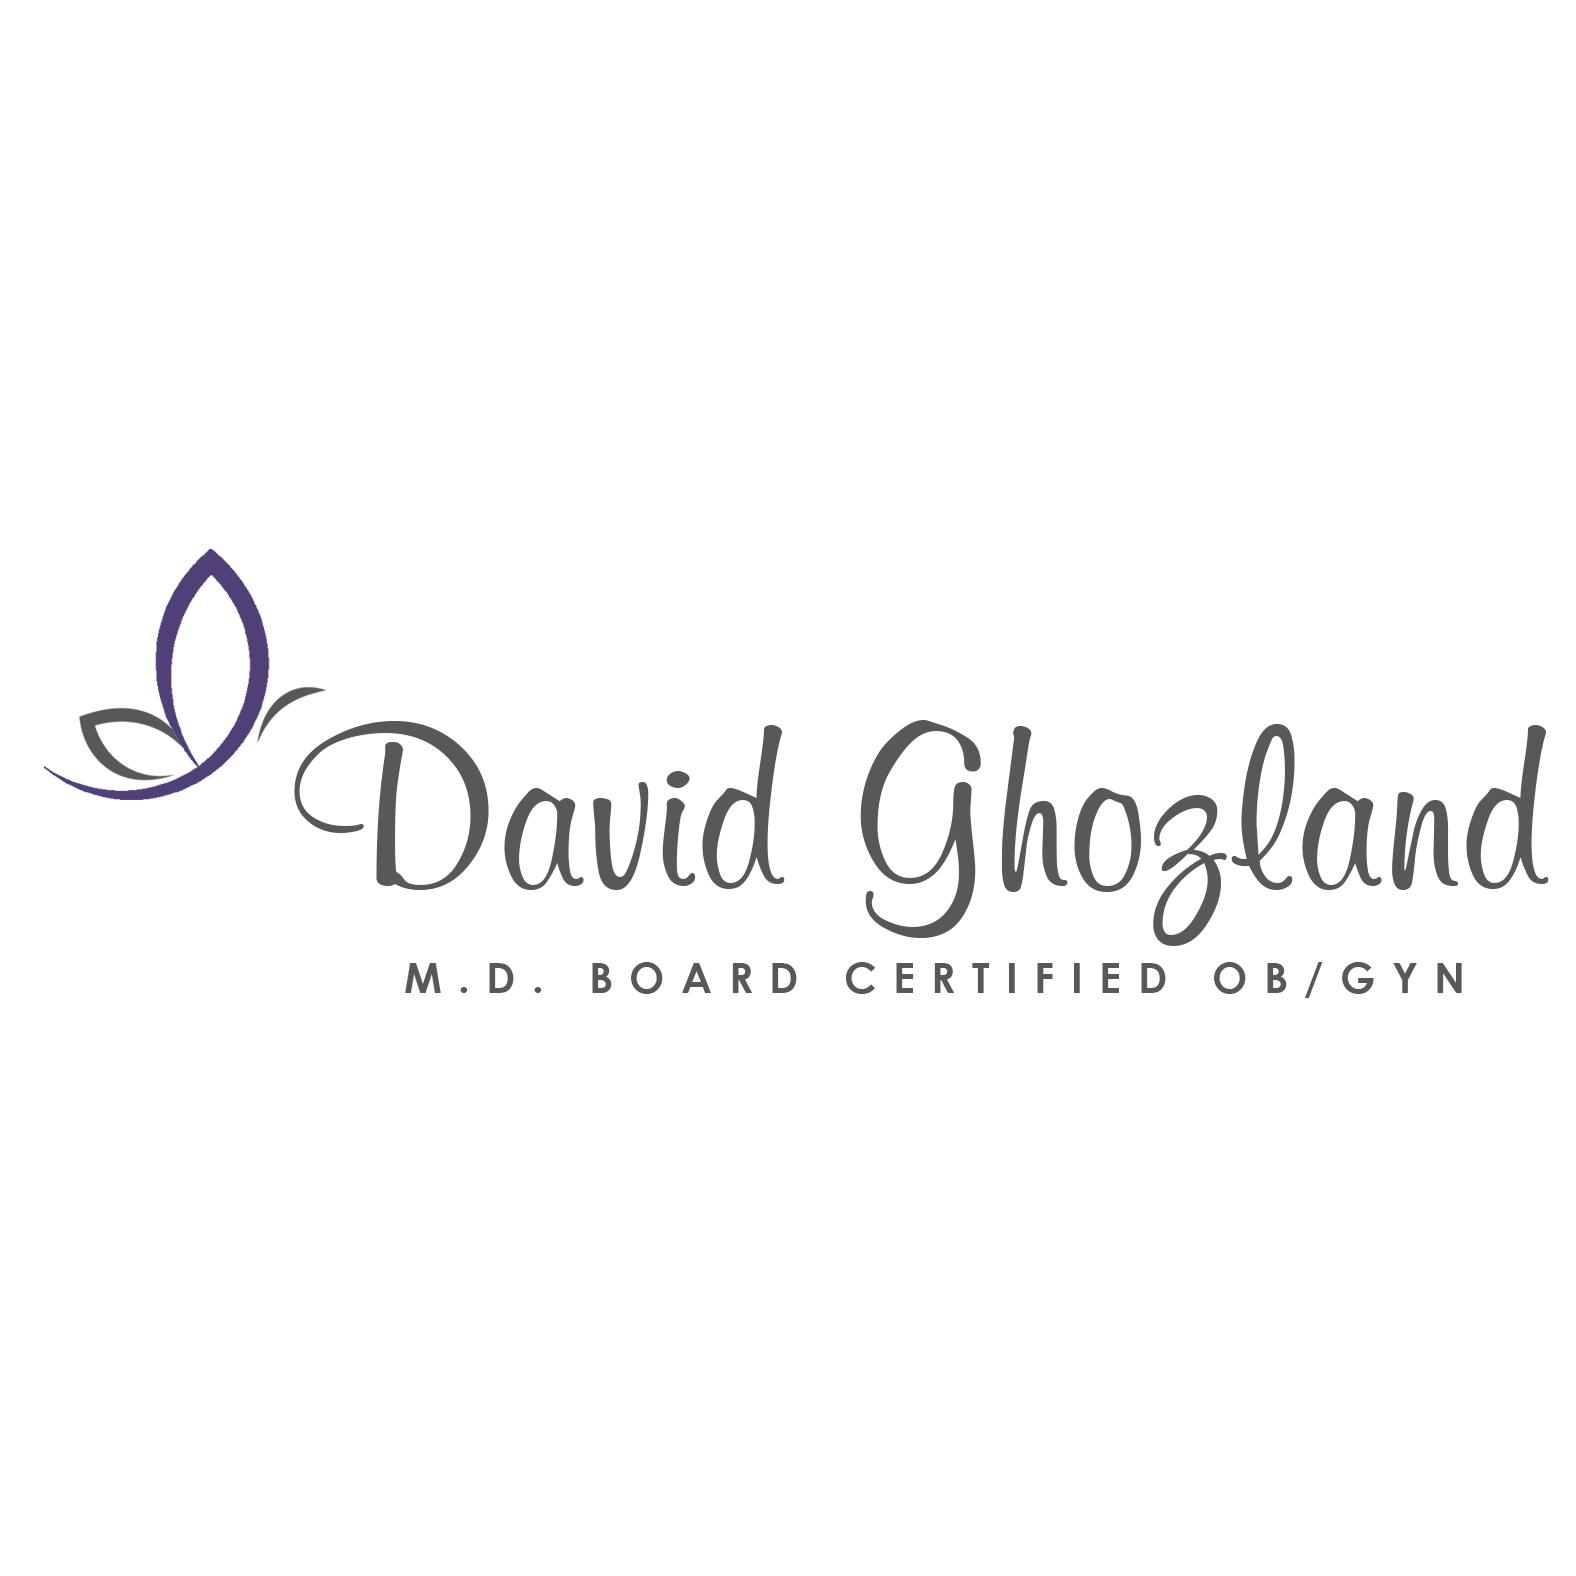 David Ghozland, M.D., INC. - Los Angeles, CA - Plastic & Cosmetic Surgery